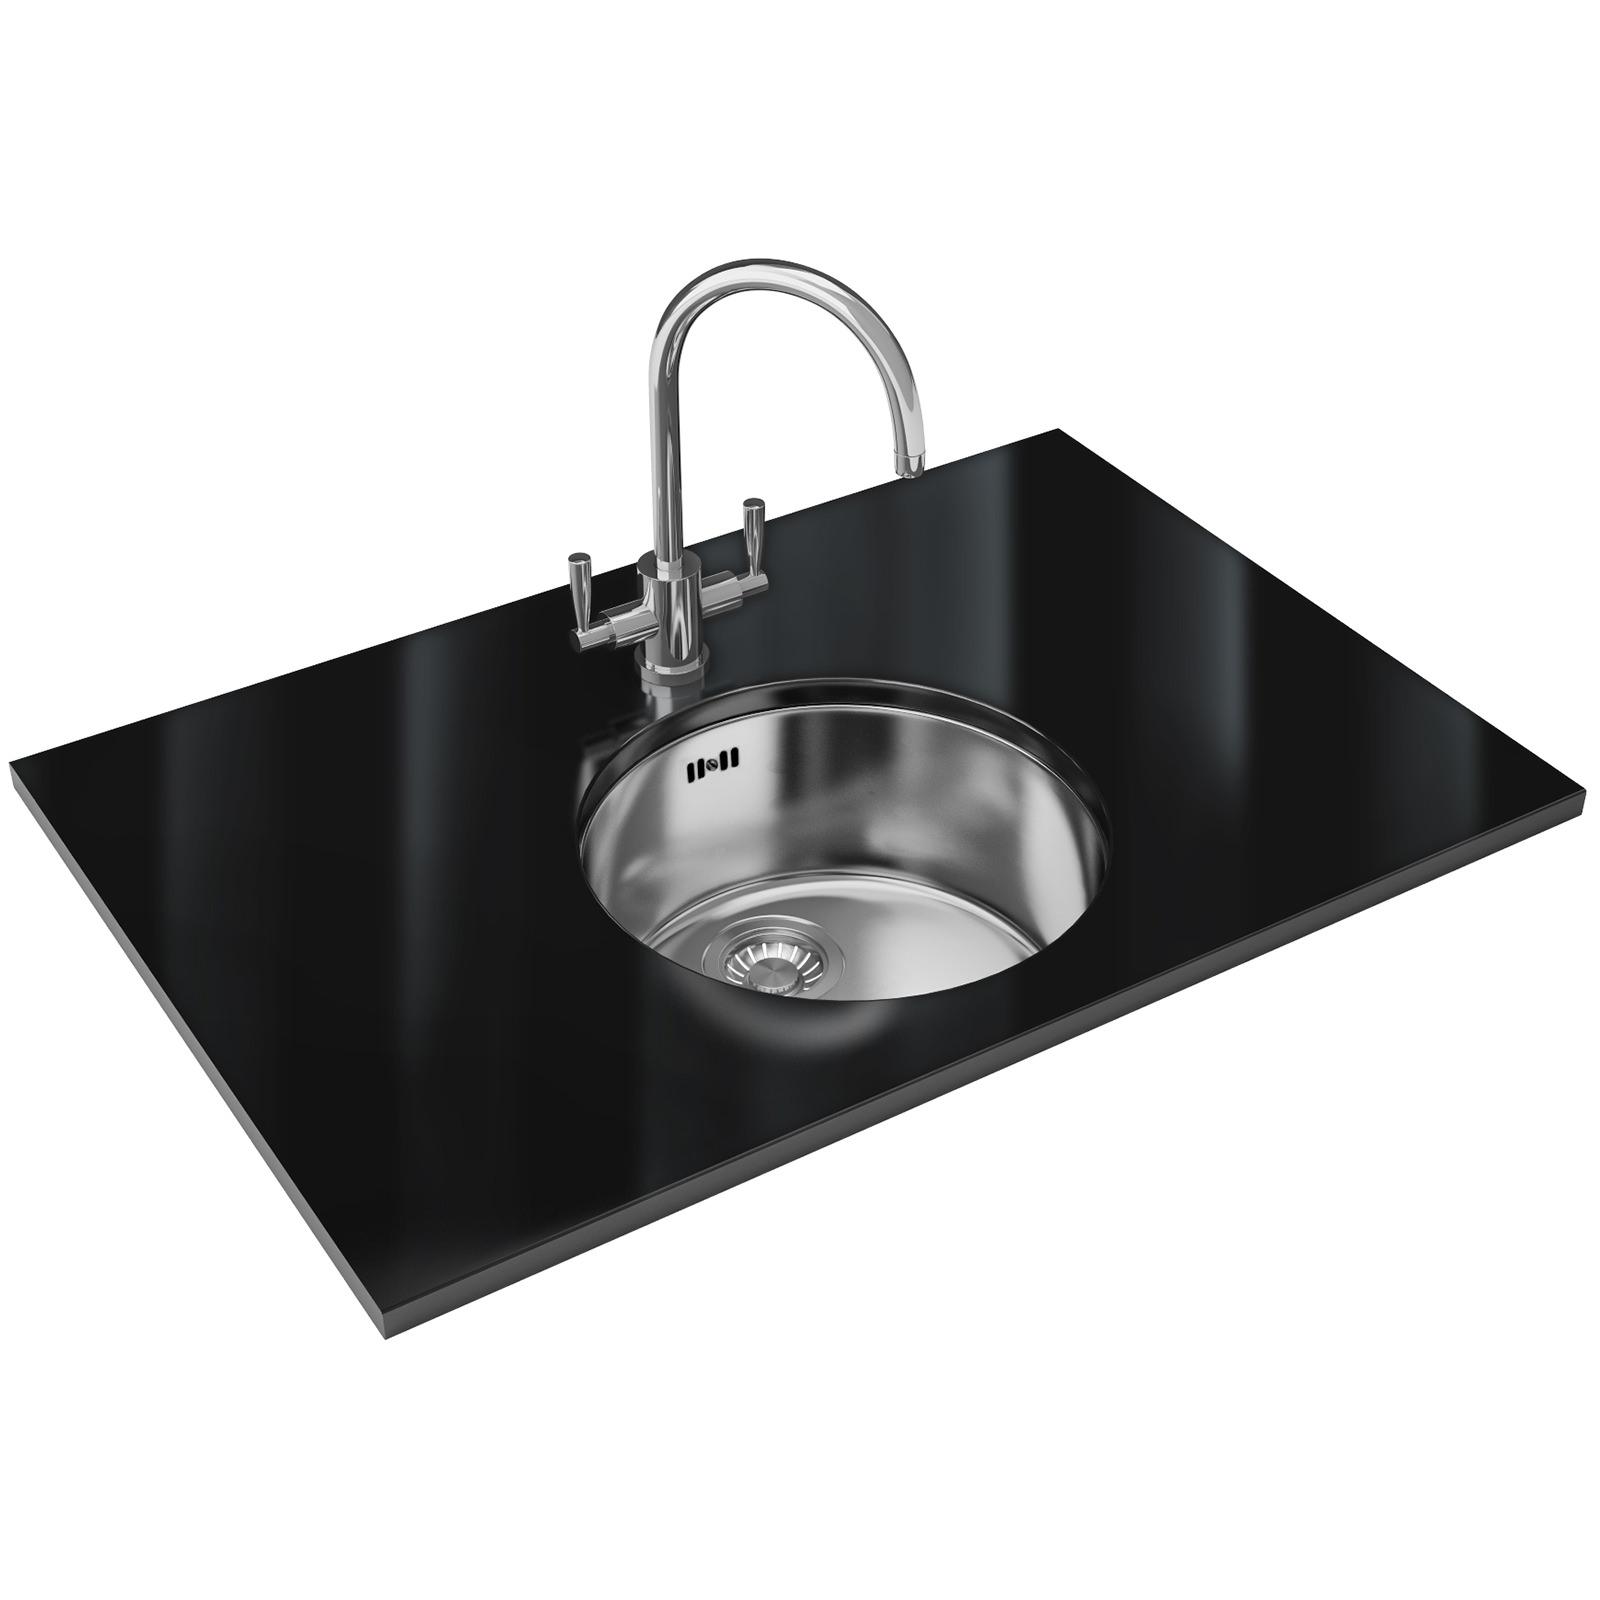 Franke Rotondo RUX 110 Stainless Steel 1.0 Bowl Undermount Sink